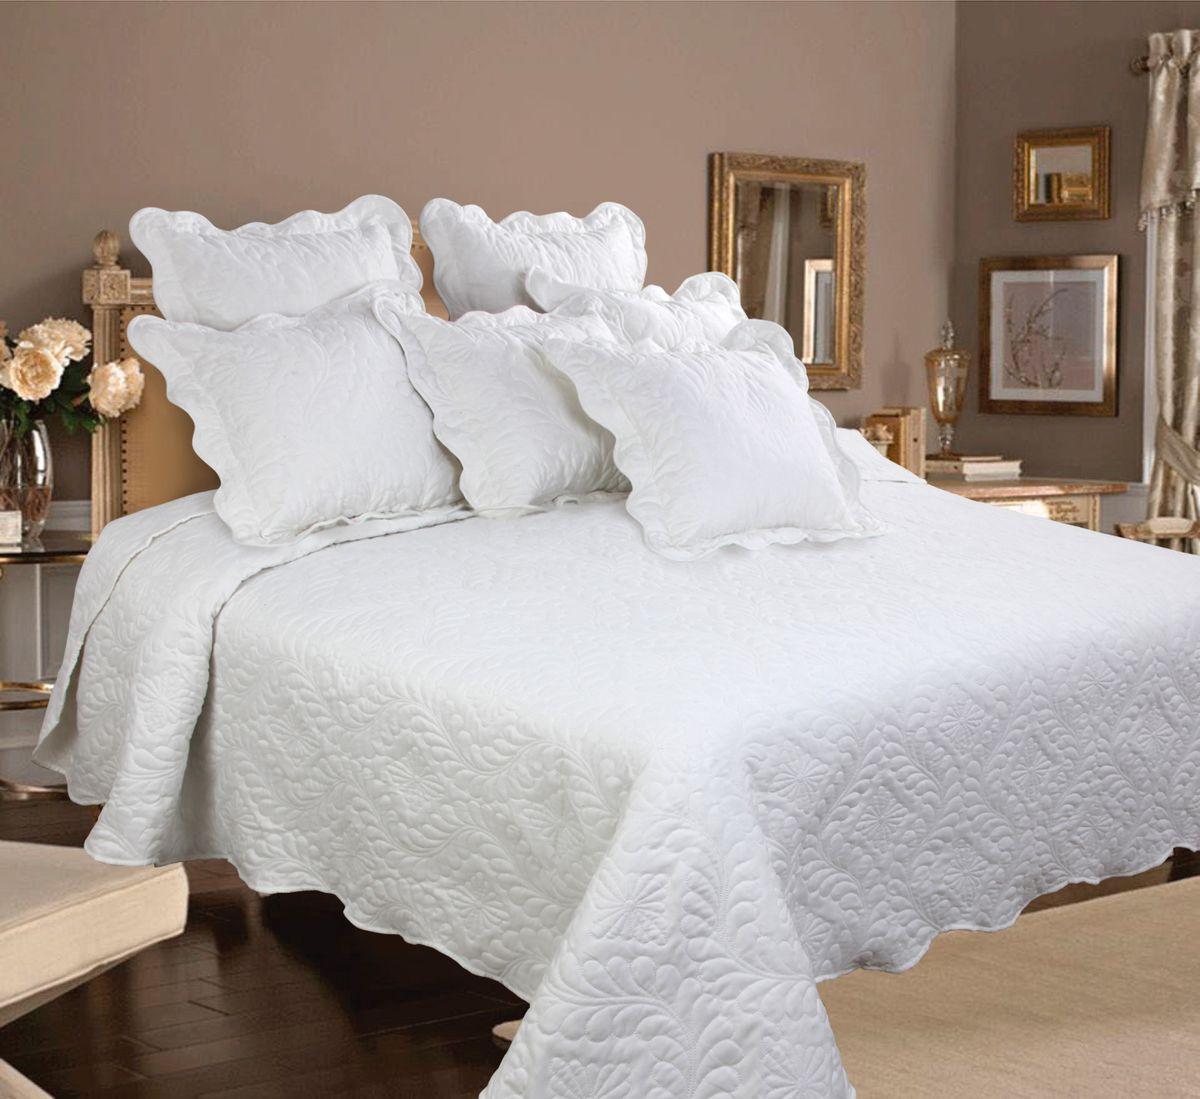 Комплект для спальни Mona Liza Royal White: покрывало 240 см х 260 см, 2 наволочки 40 см х 40 см, цвет: белый